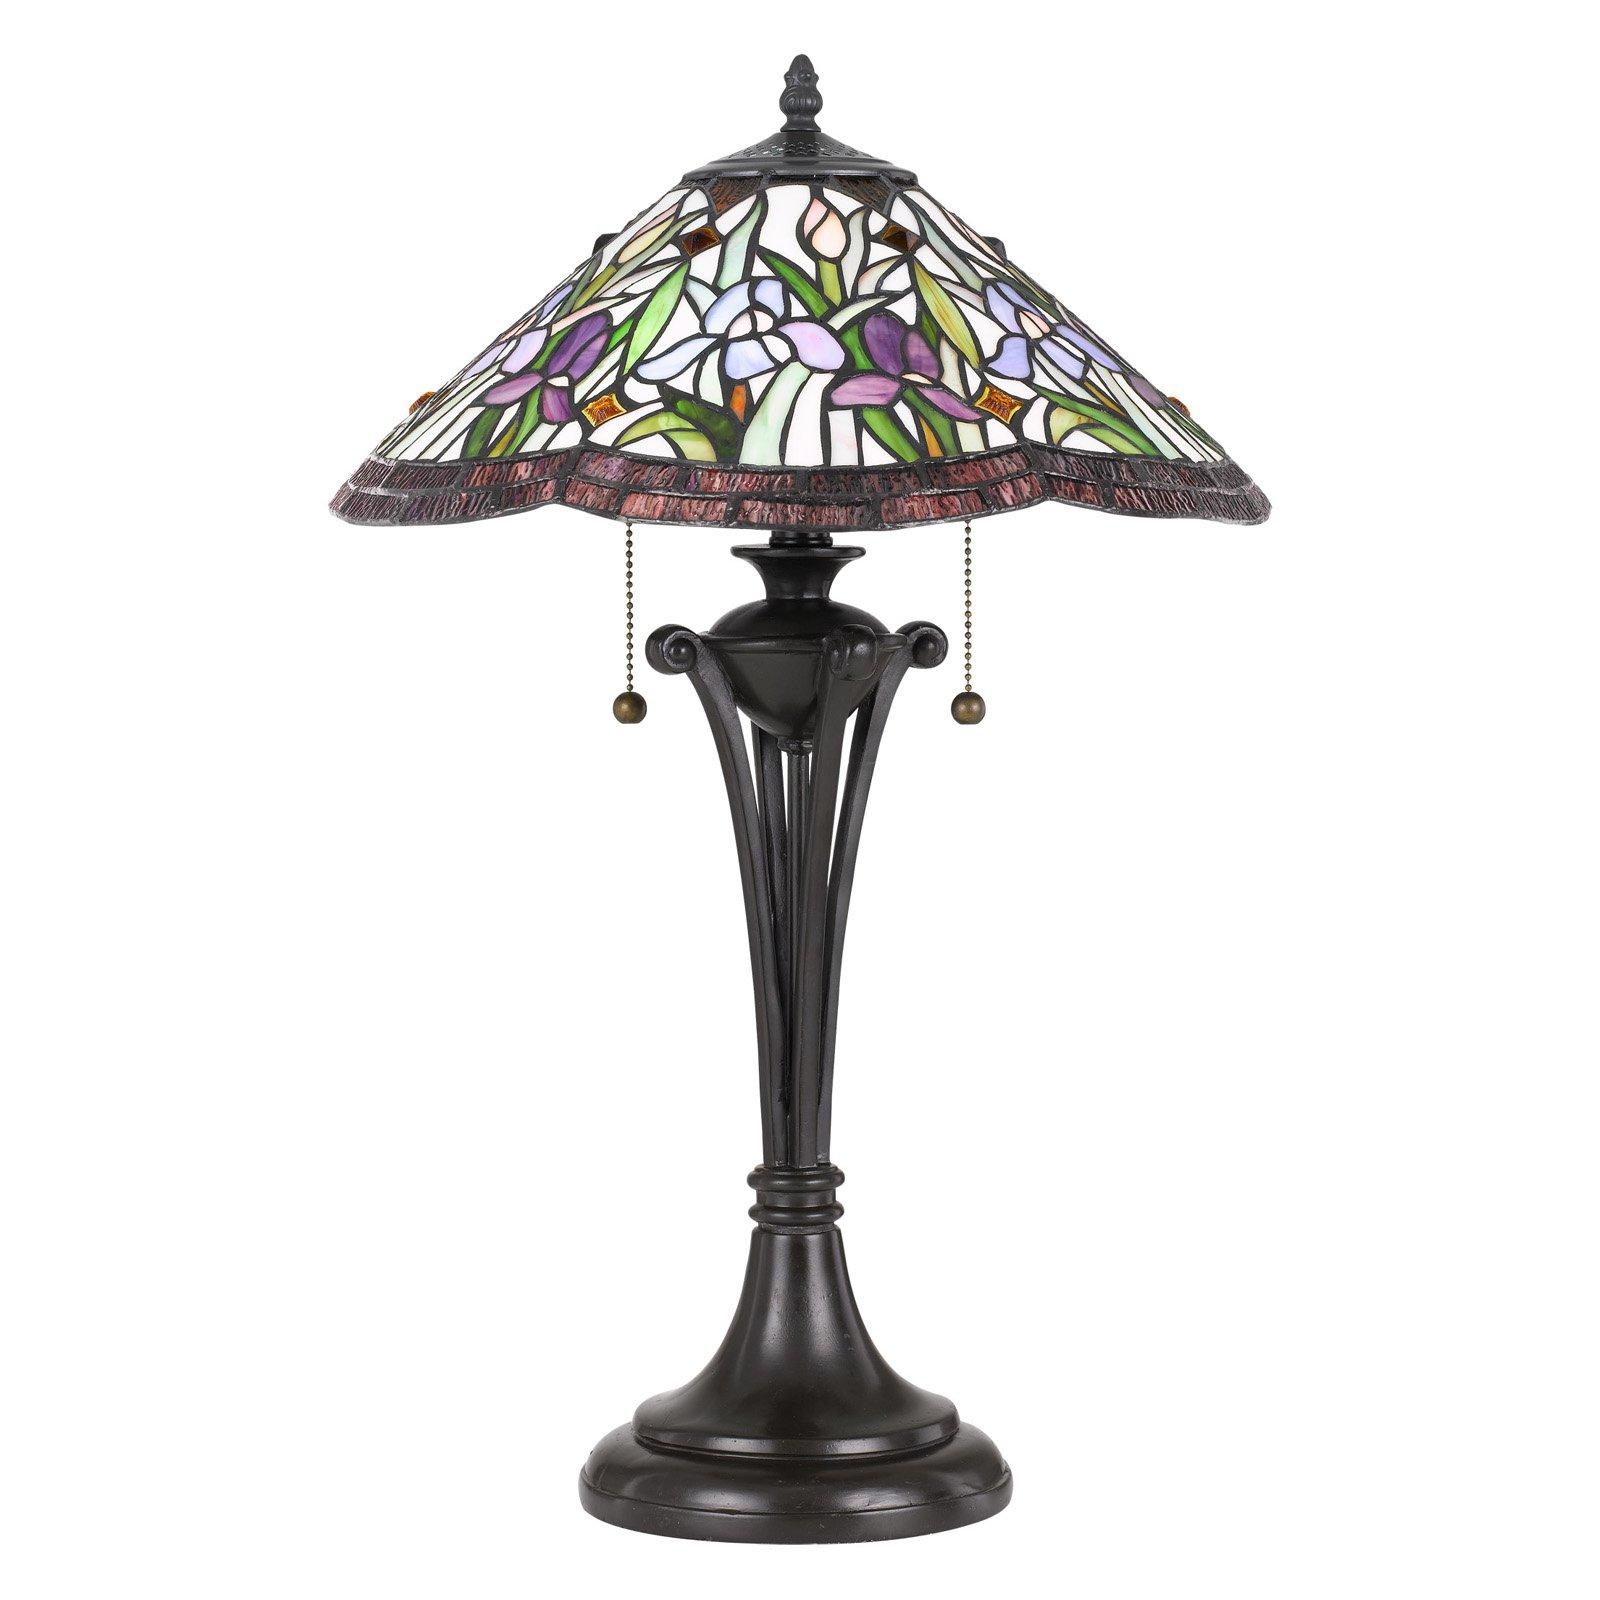 Quoizel Tf3456tvb Tiffany Table Lamp Walmart Com